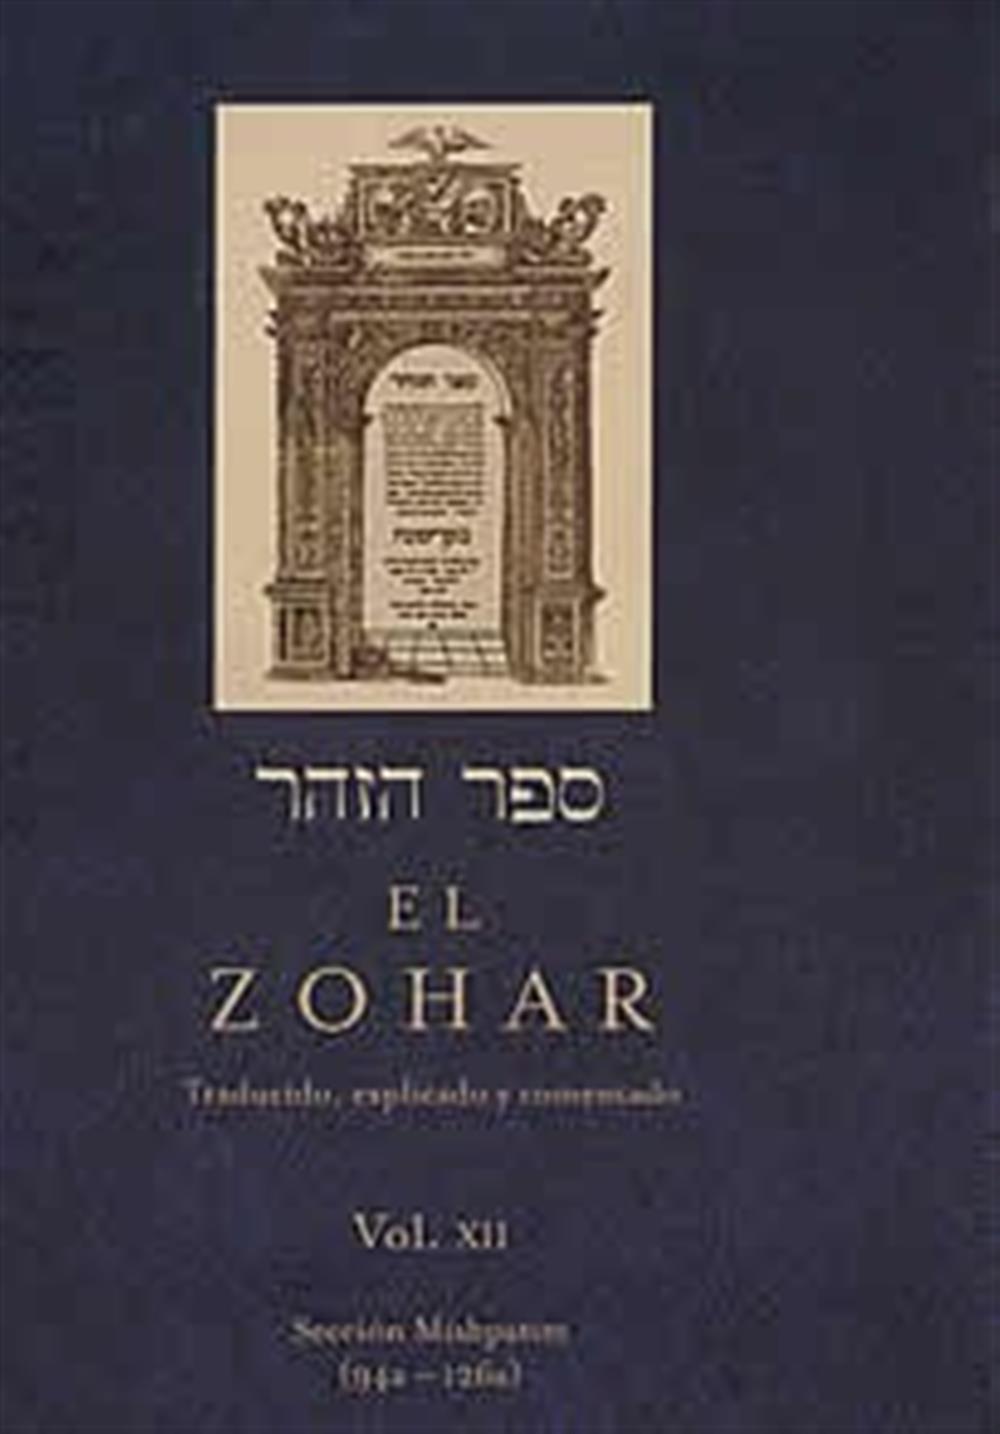 El Zohar-Vol-XII-Sección Mishpatim-(94a-126a)